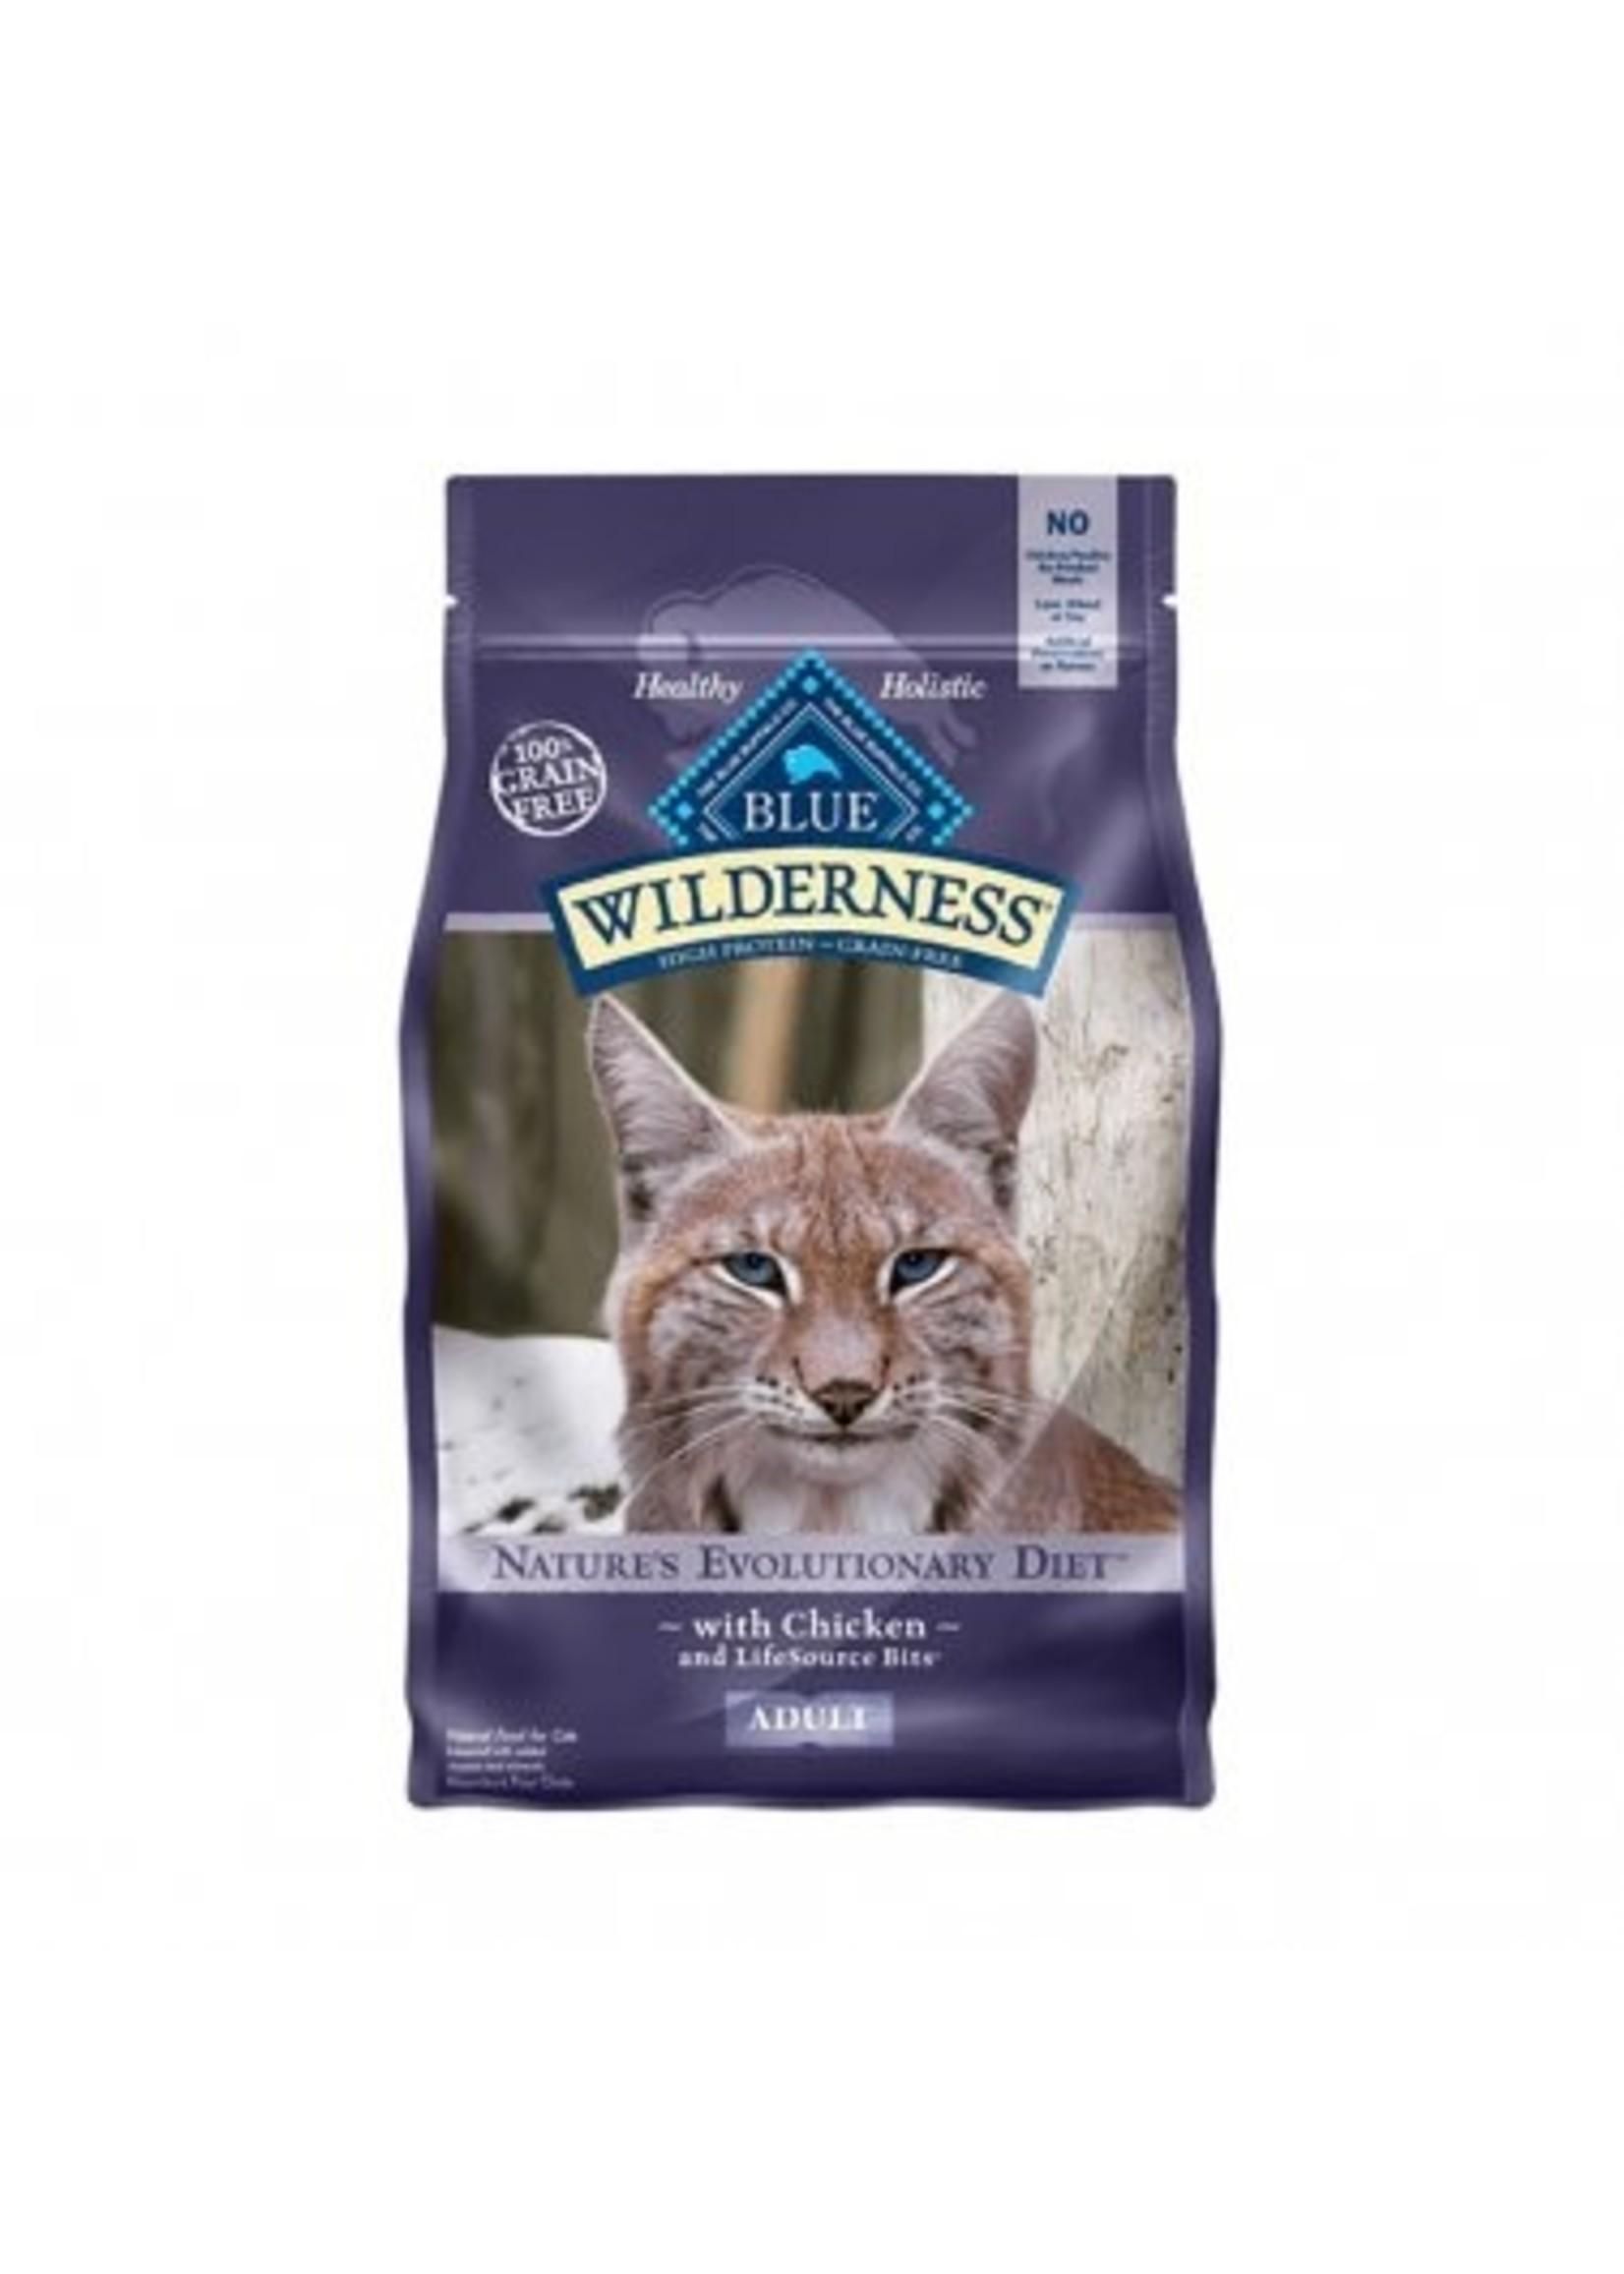 Blue Buffalo Blue Wilderness™ Nature's Evolutionary Diet Grain Free Chicken Adult Cat Food 6 Lbs